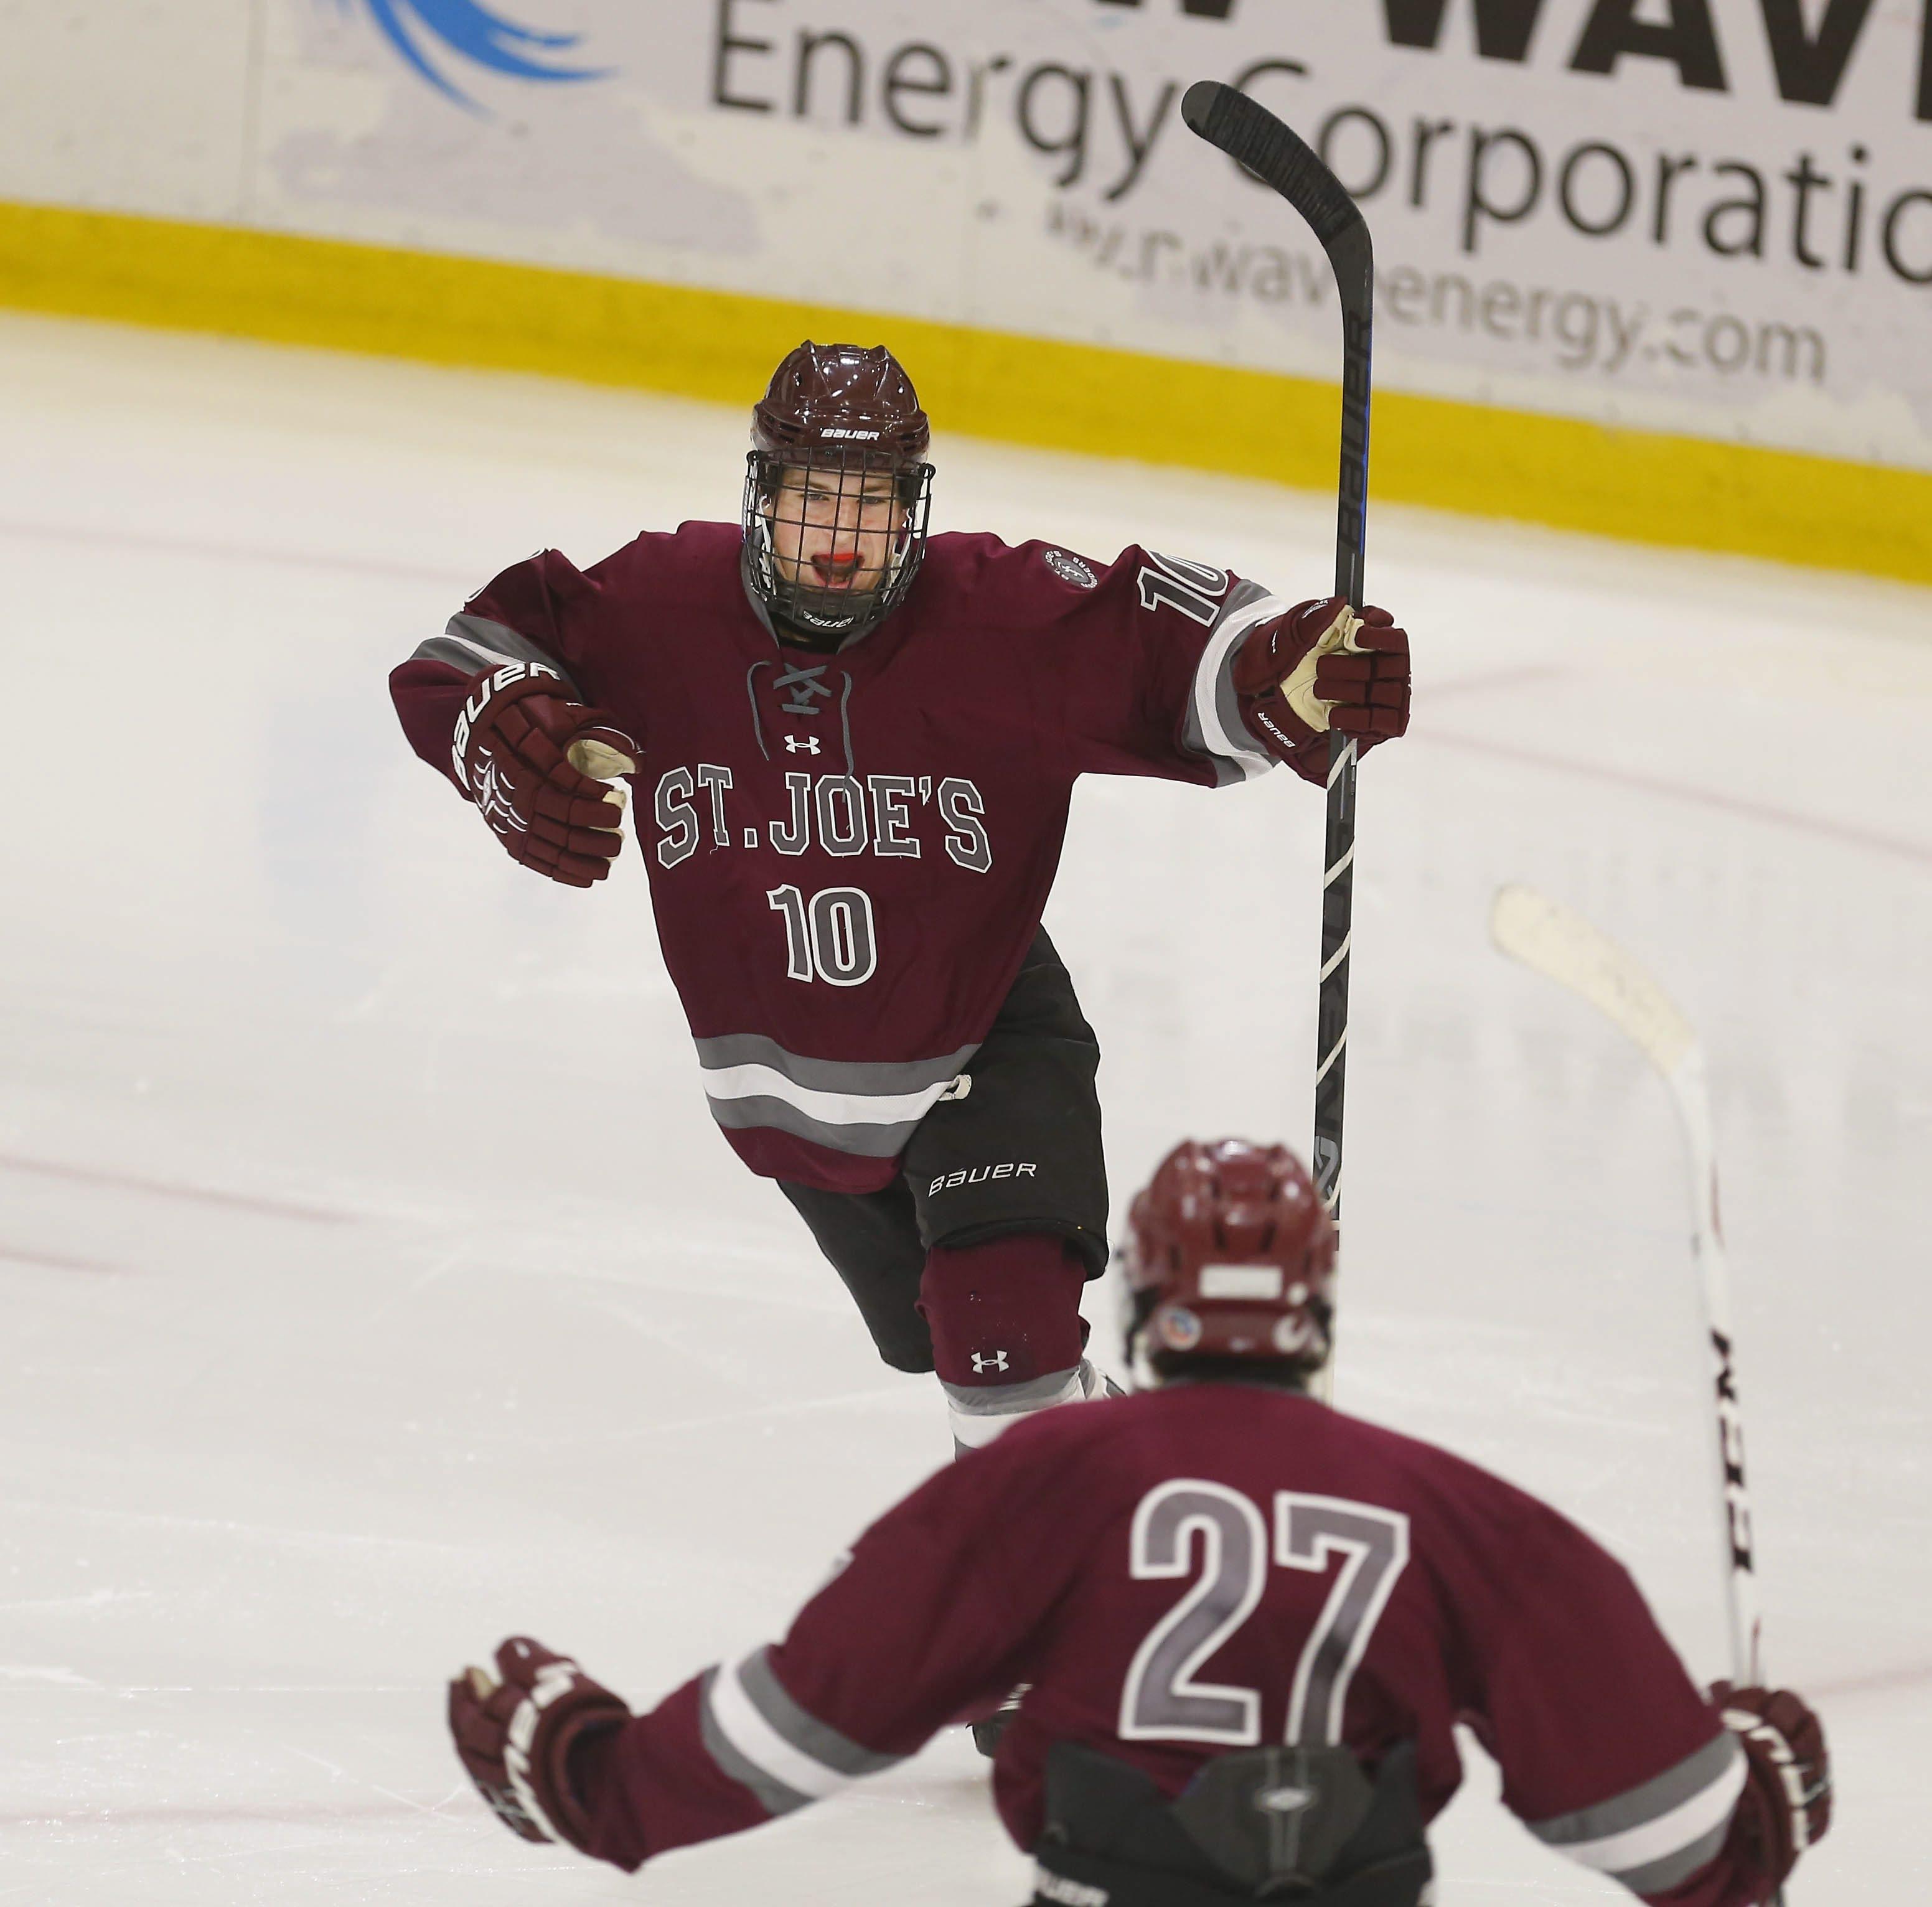 St. Joe's Michael Greco is on the Buffalo high school juniors team.